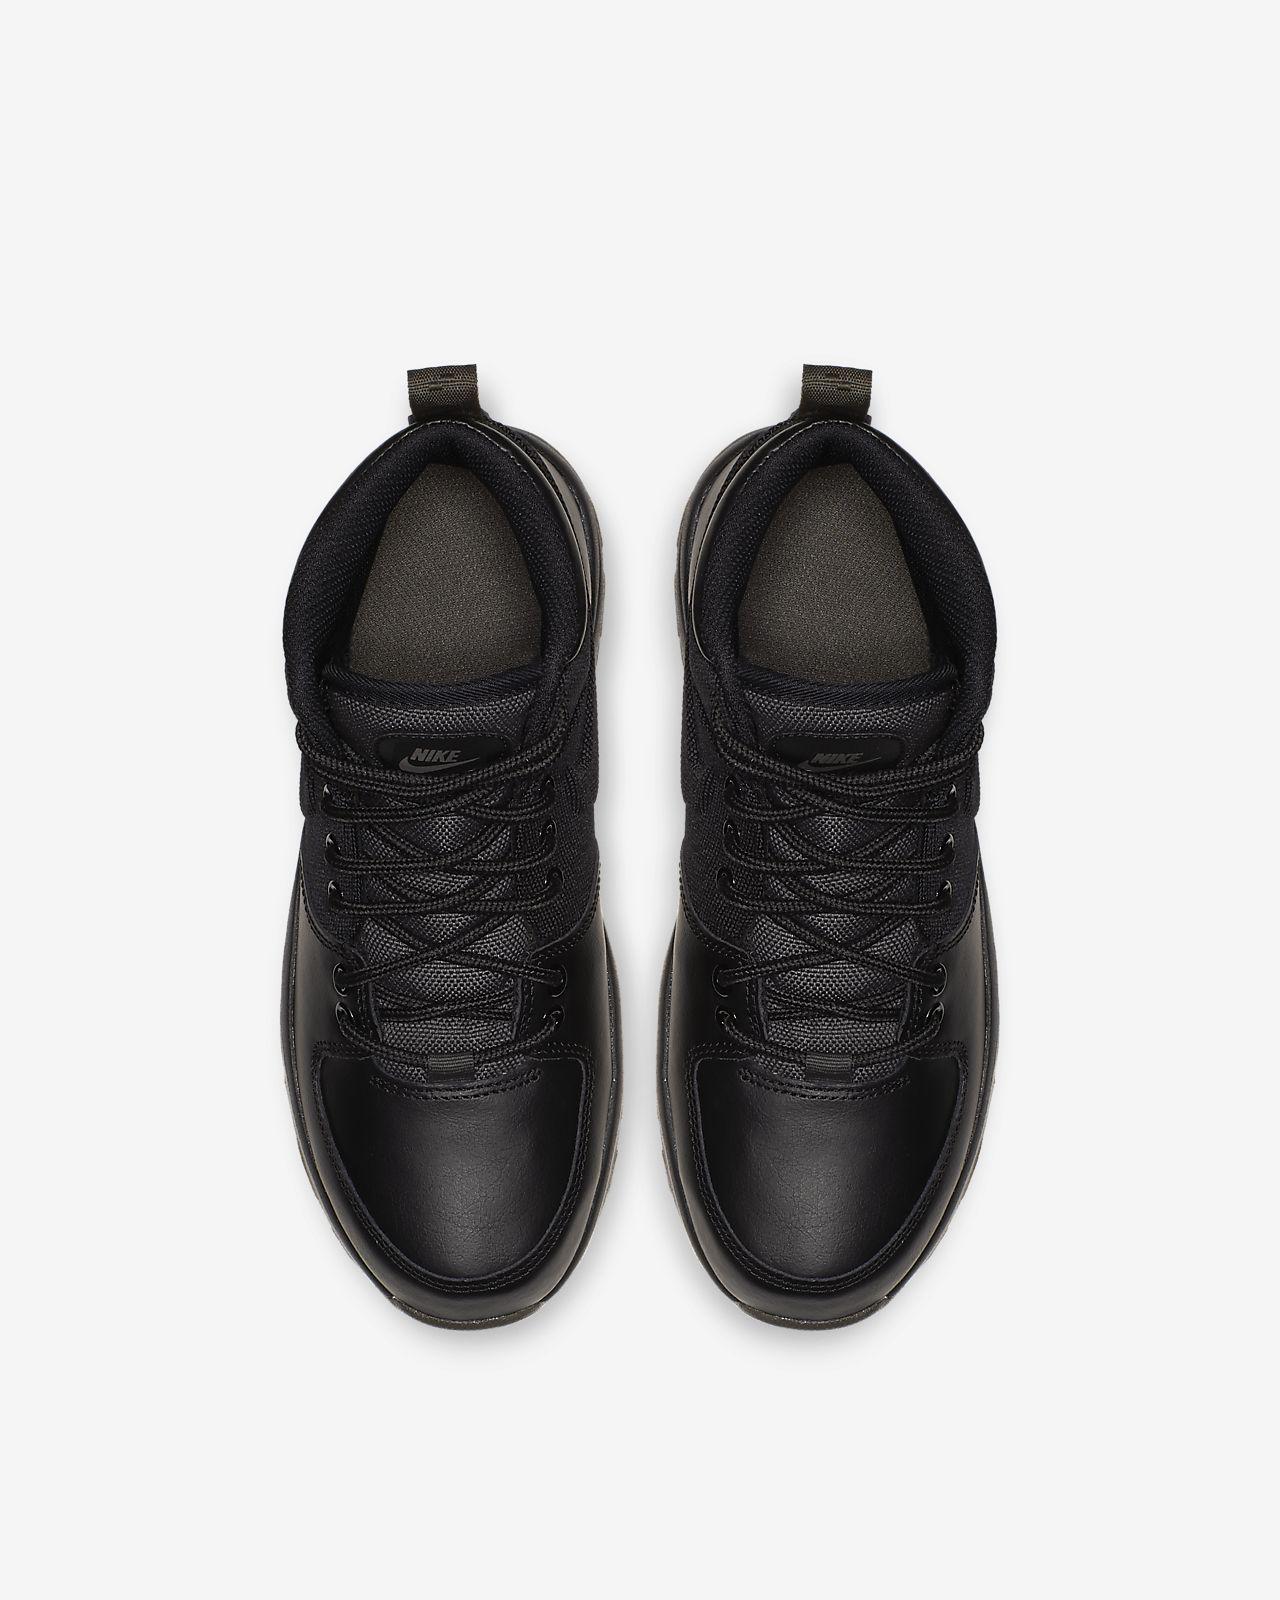 separation shoes 2d66b e6b3b ... Nike Manoa Older Kids  Boot